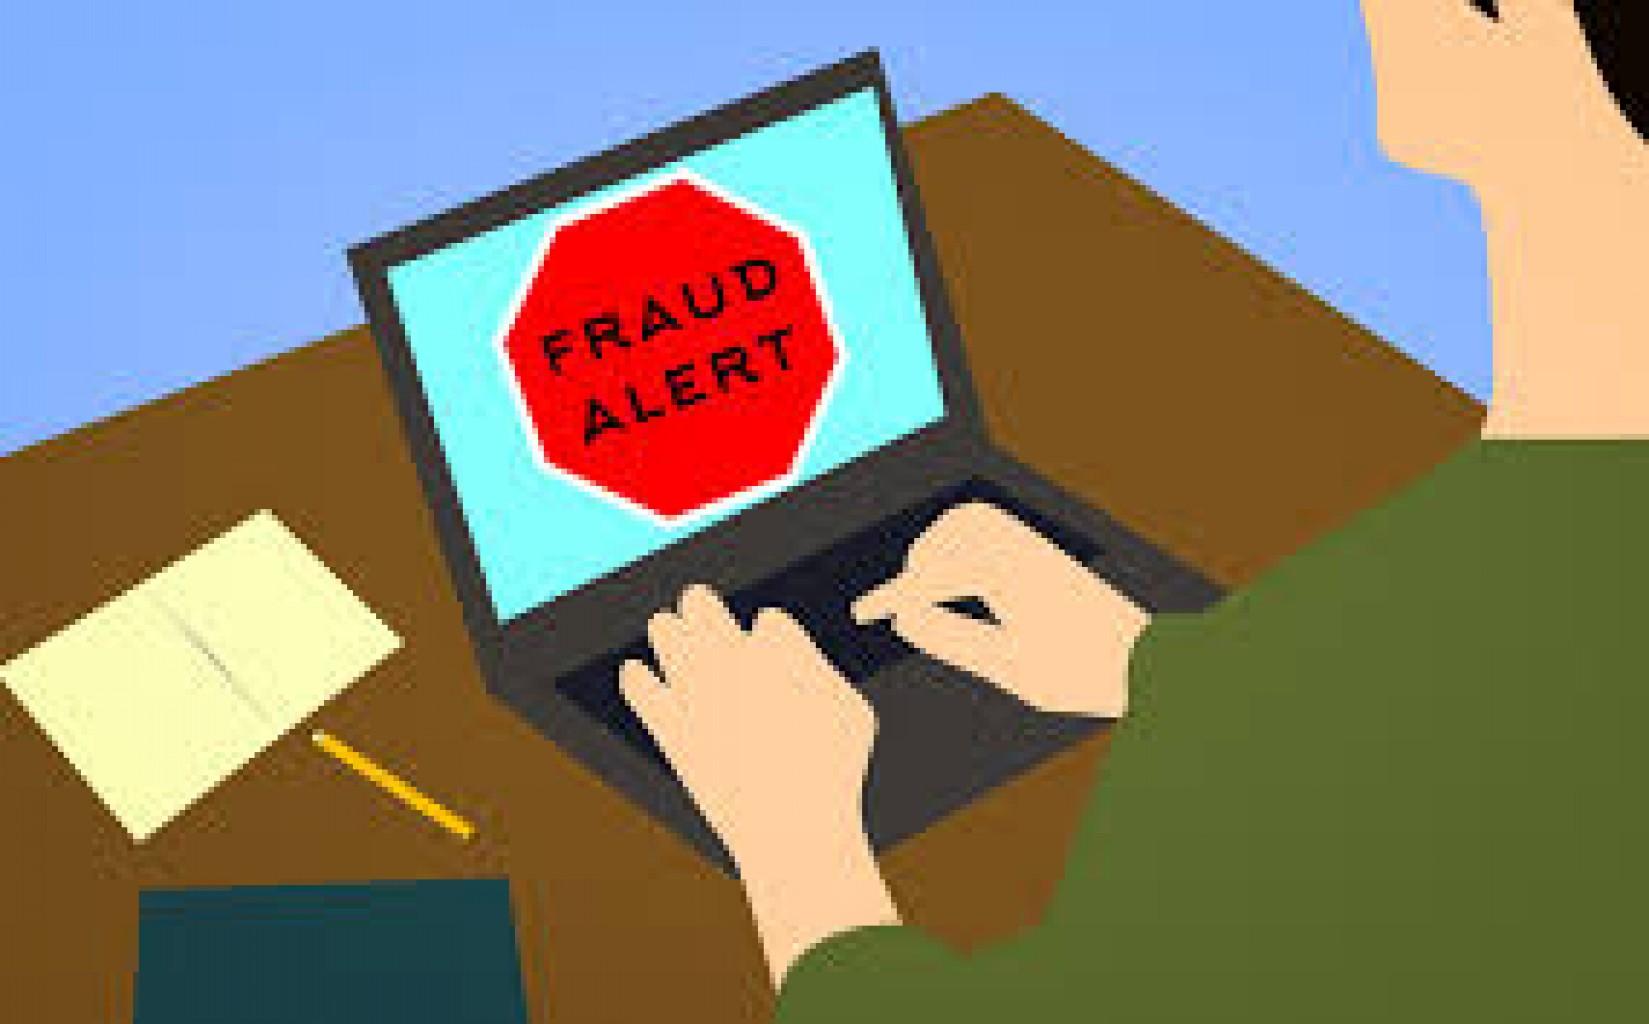 Protegerse del fraude